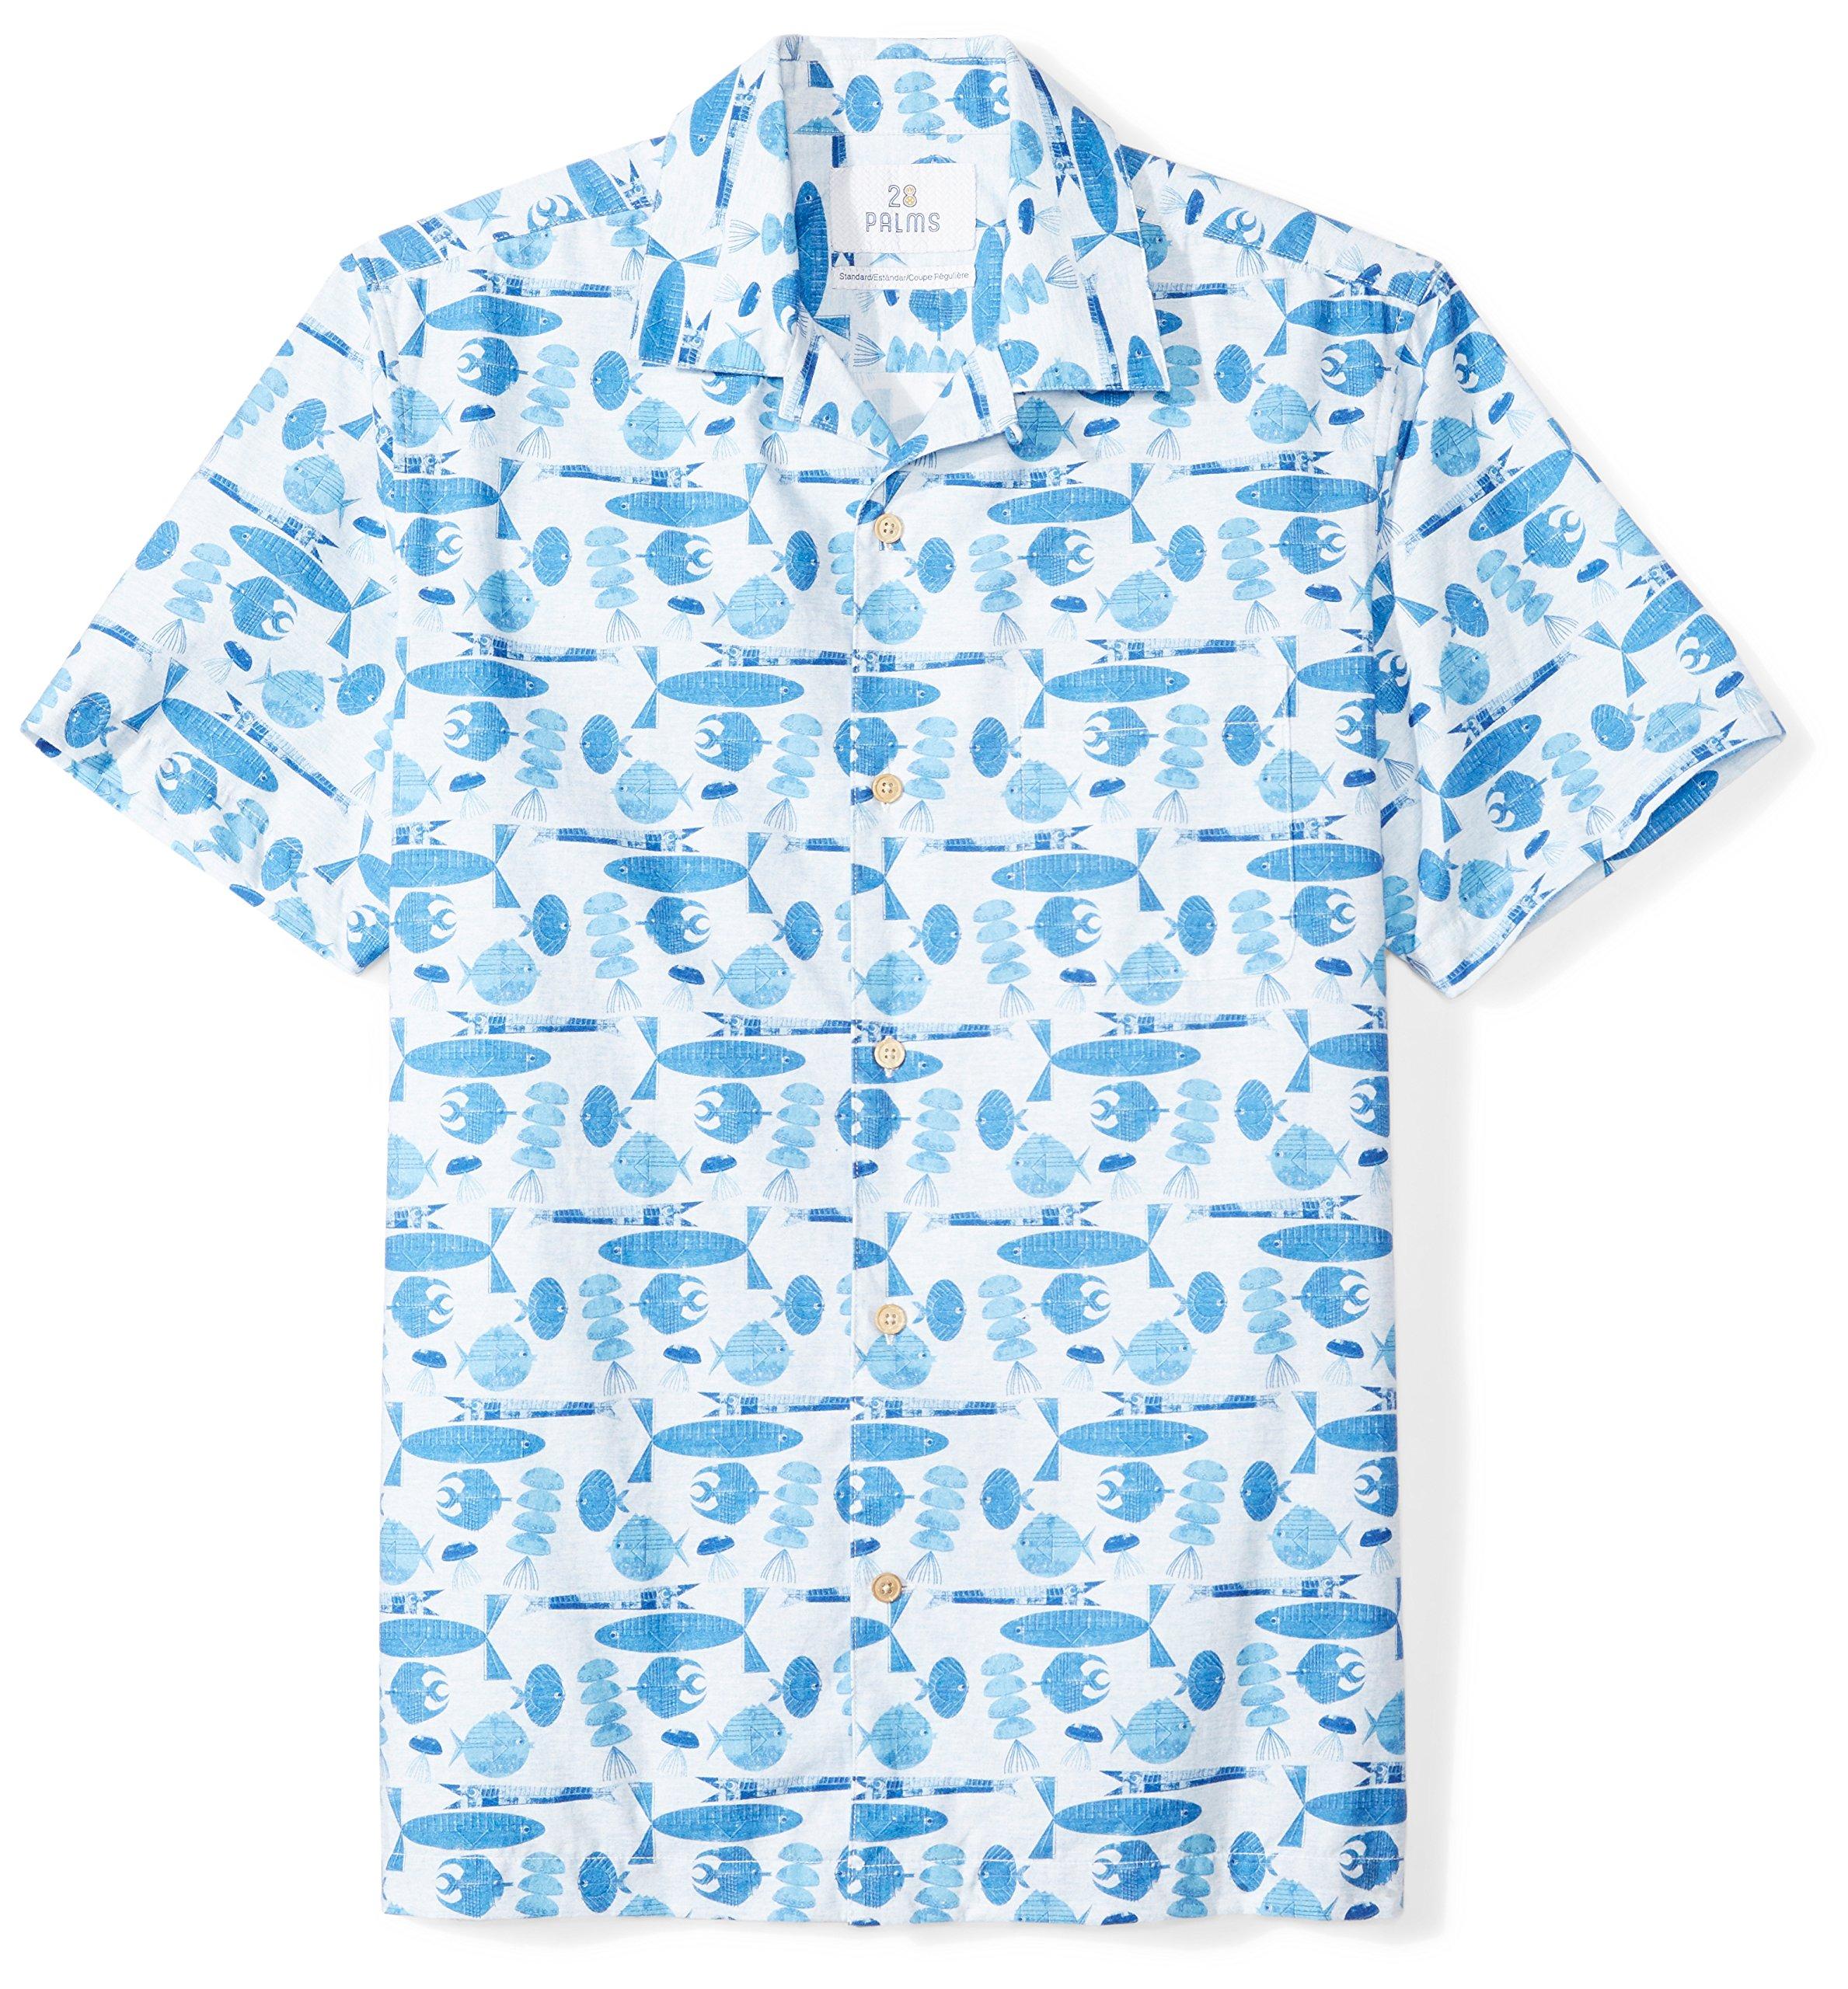 28 Palms Men's Standard-Fit 100% Cotton Tropical Hawaiian Shirt, Blue Tiki Fish, X-Large